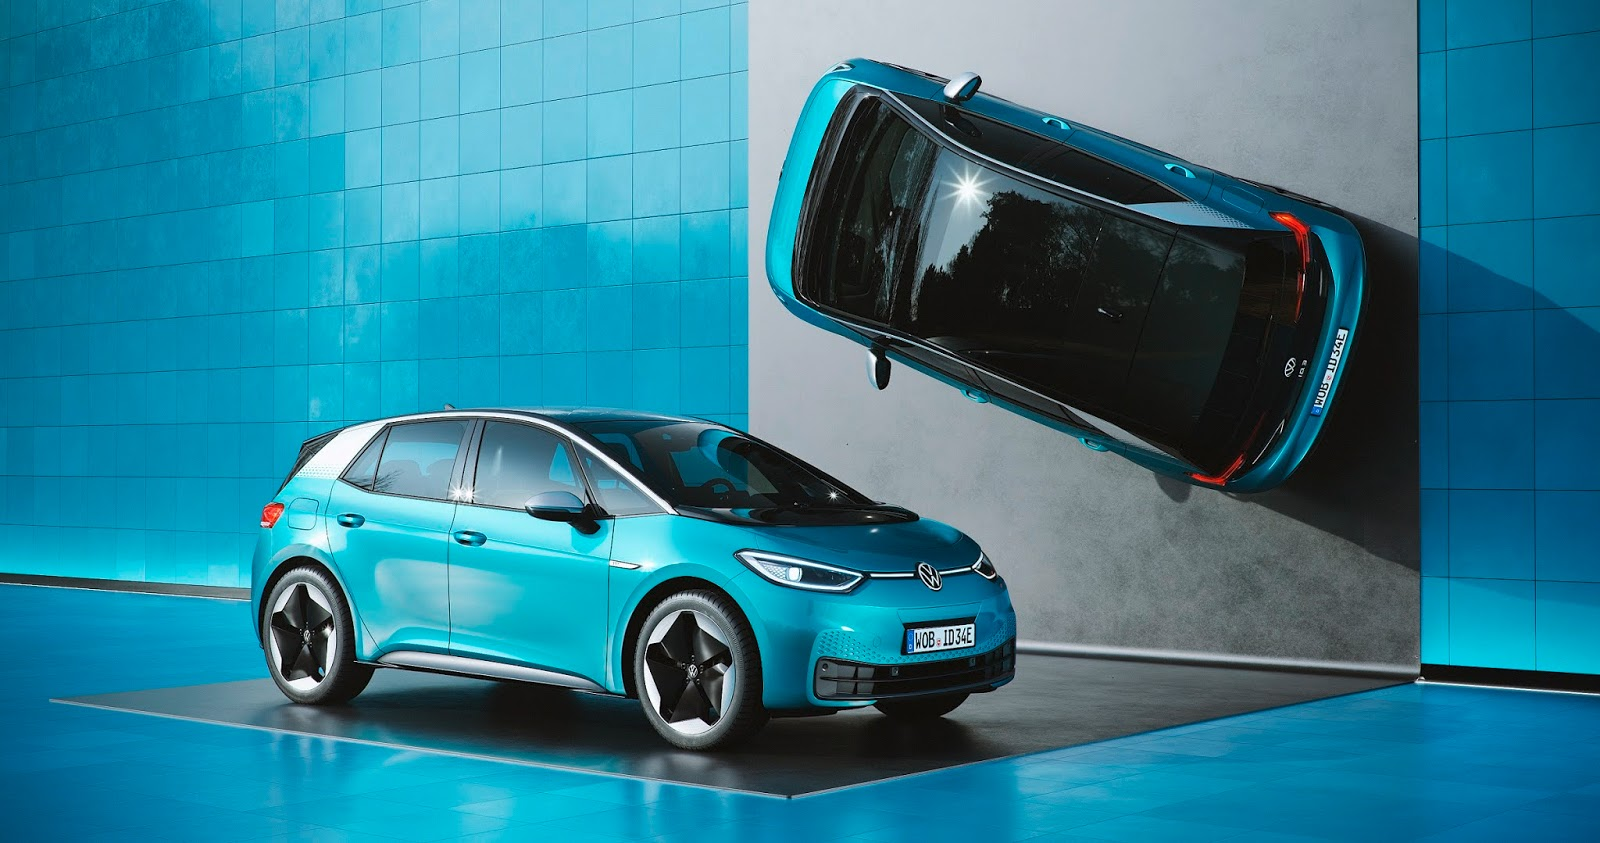 VOLKSWAGEN ID.3 Volkswagen : Κυρίαρχη στην ηλεκτροκίνηση το 2021 Electric cars, electric vehicles, Hybrid, plug-in hybrid, Volkswagen, zblog, ειδήσεις, ηλεκτρικά, ηλεκτροκινηση, υβριδικό